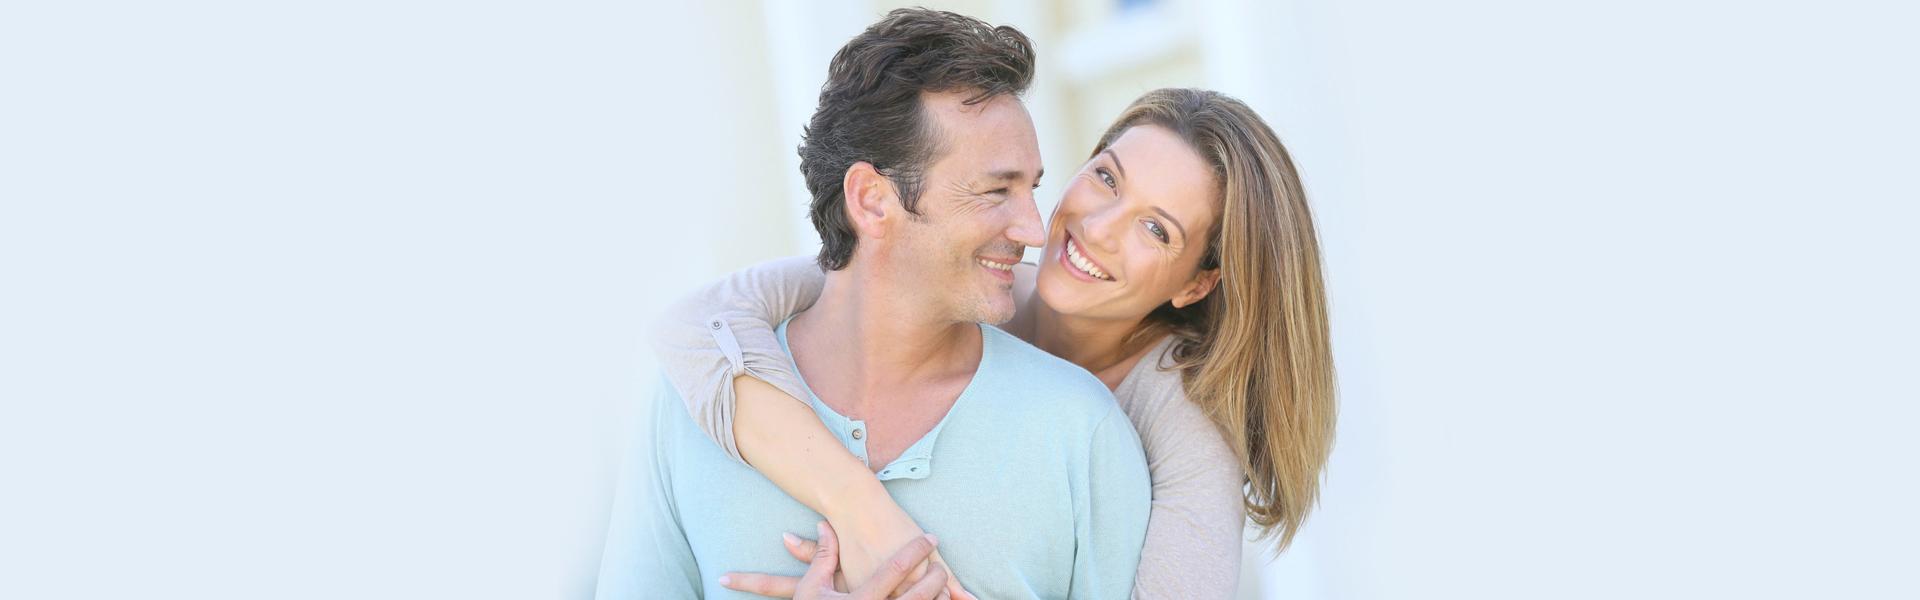 Dental Implants: Types, Benefits, and Risks